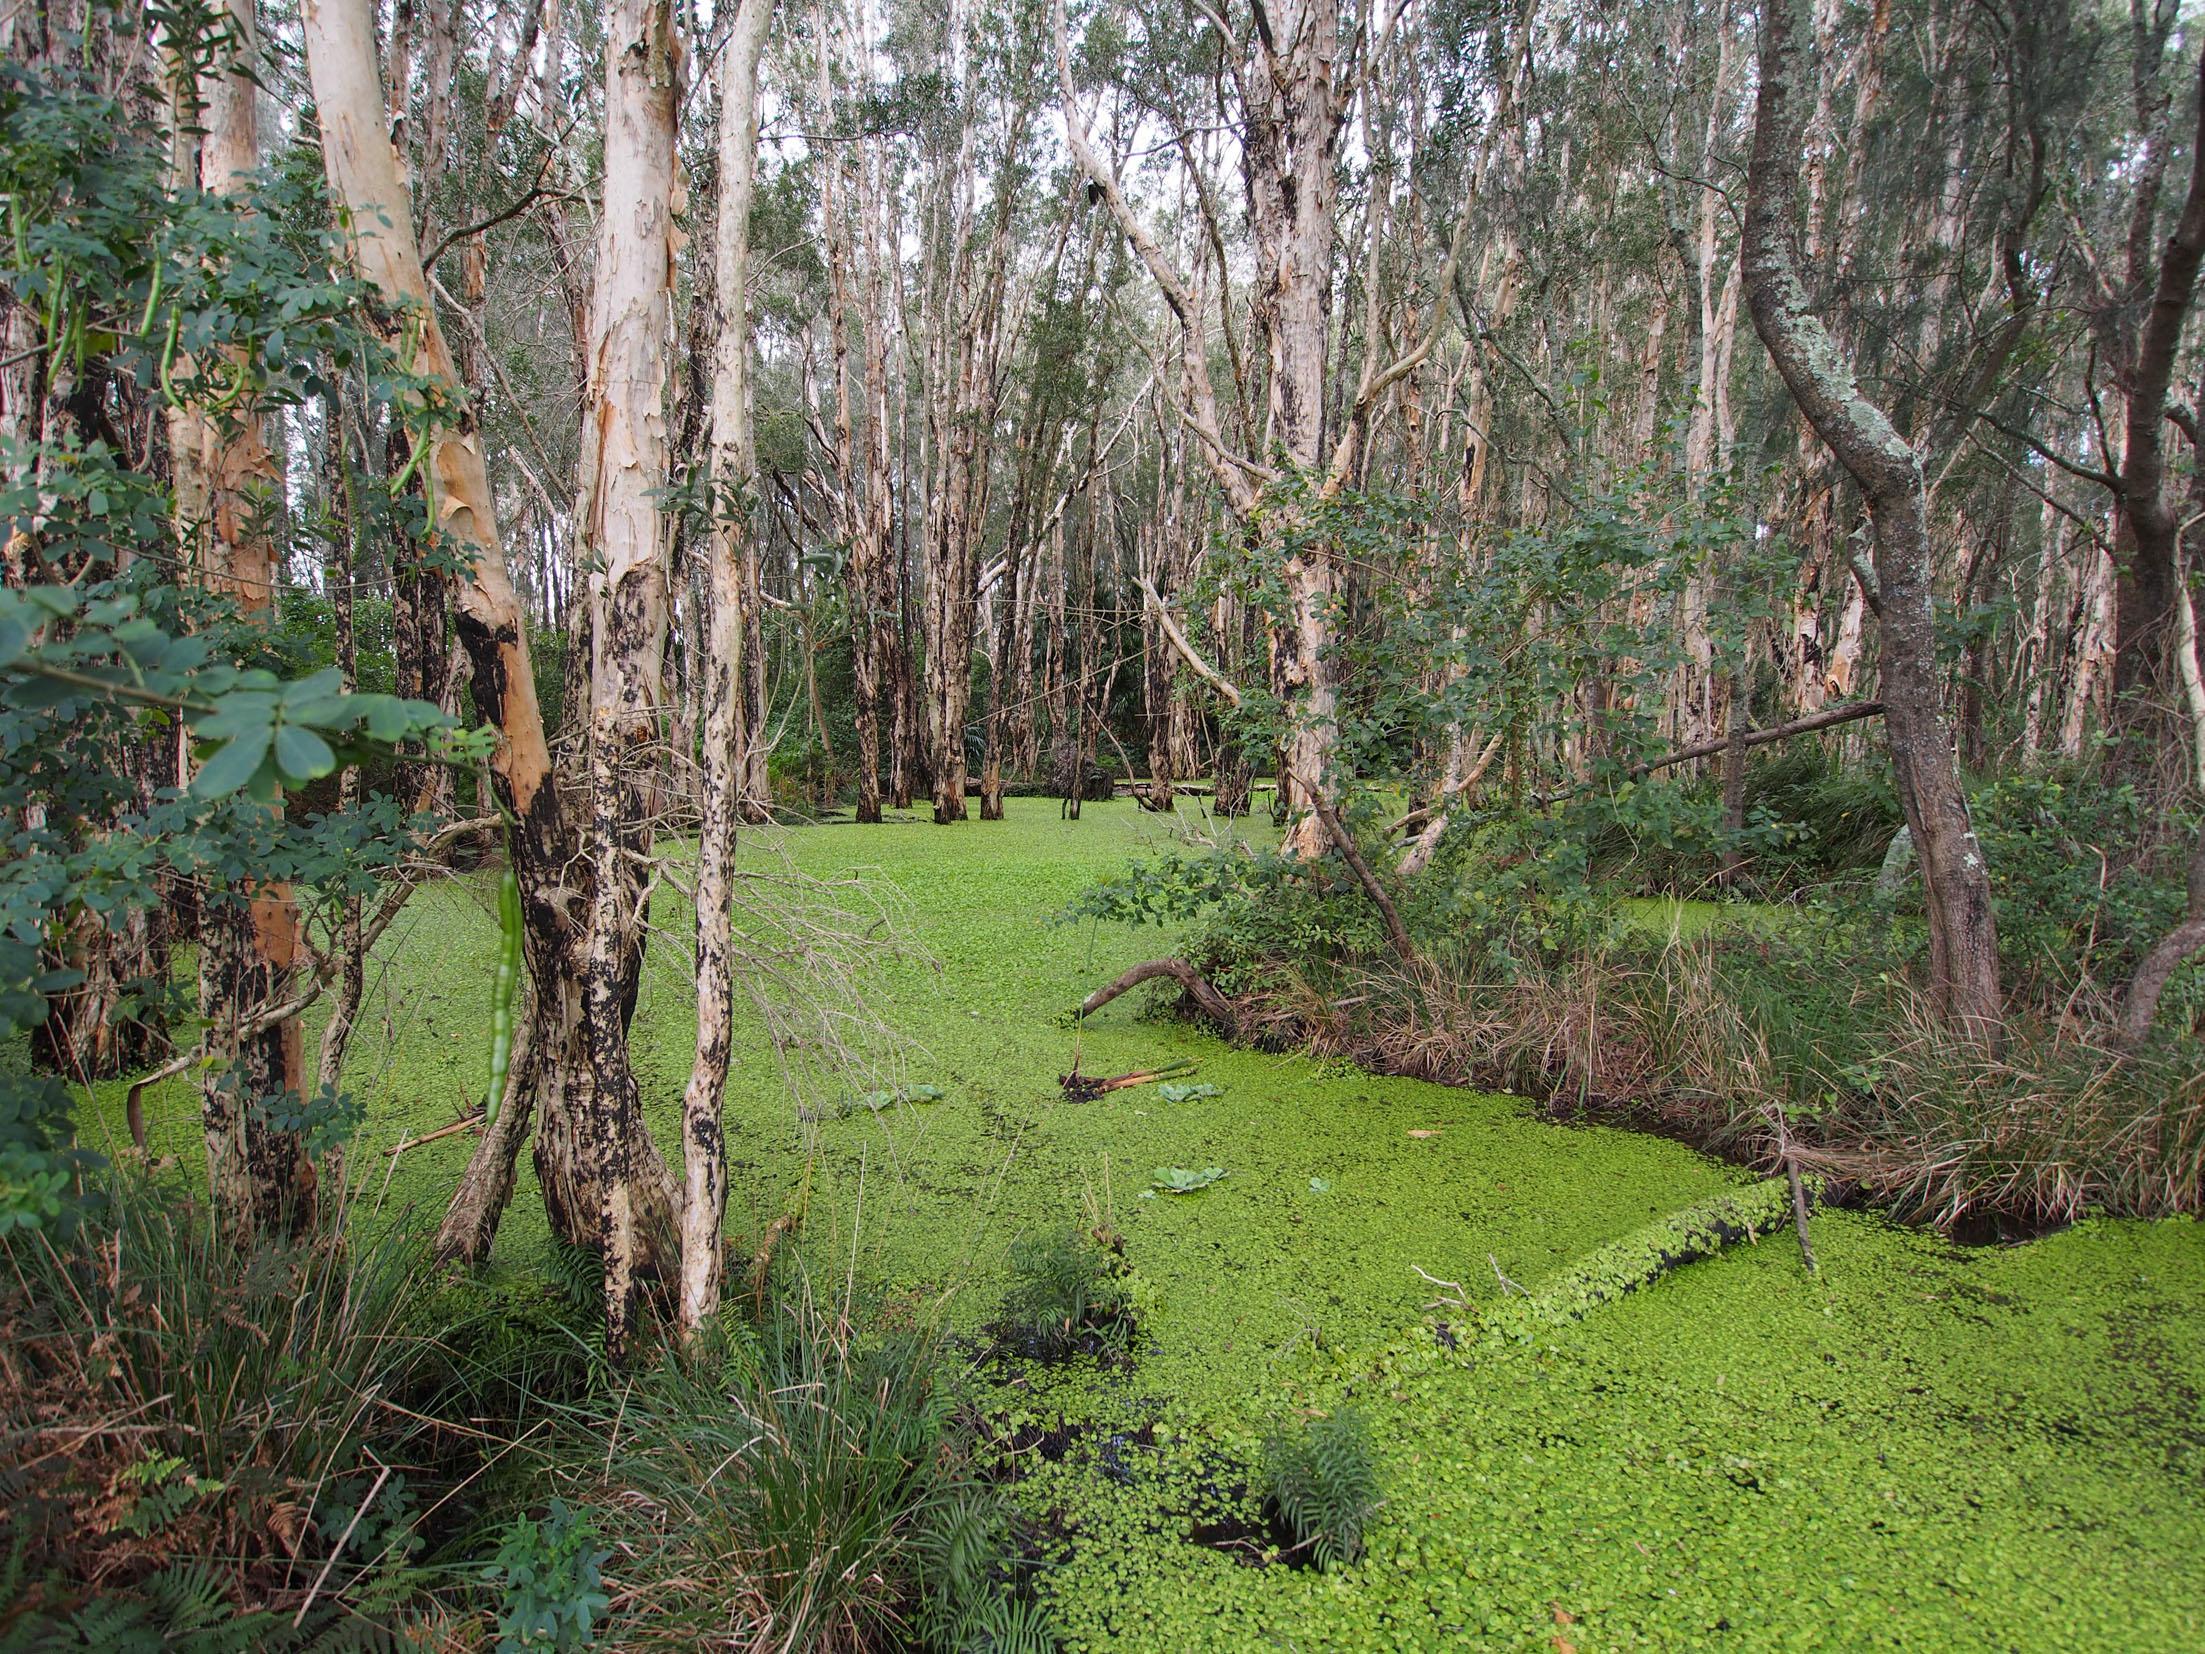 The Amazon Frogbit infestation near Forster